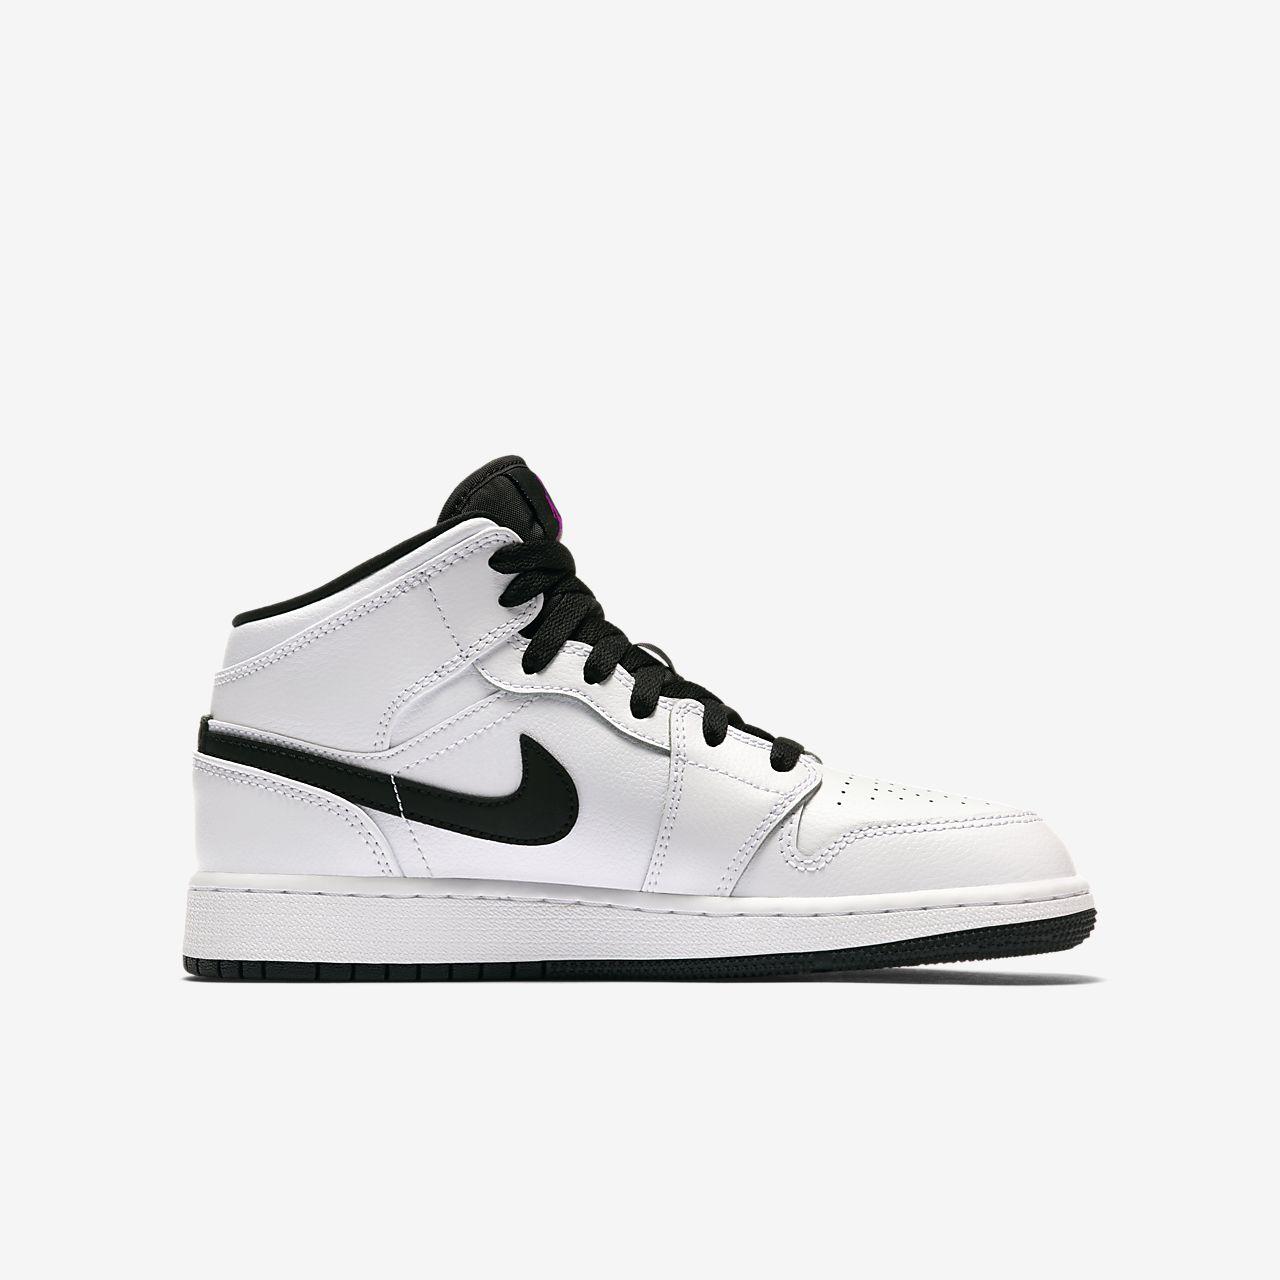 Air 45 Cosmo Eu Scarpa Mojito Nike Gtx 1 Jordan 5 Chaussures Blue IqzYxxX